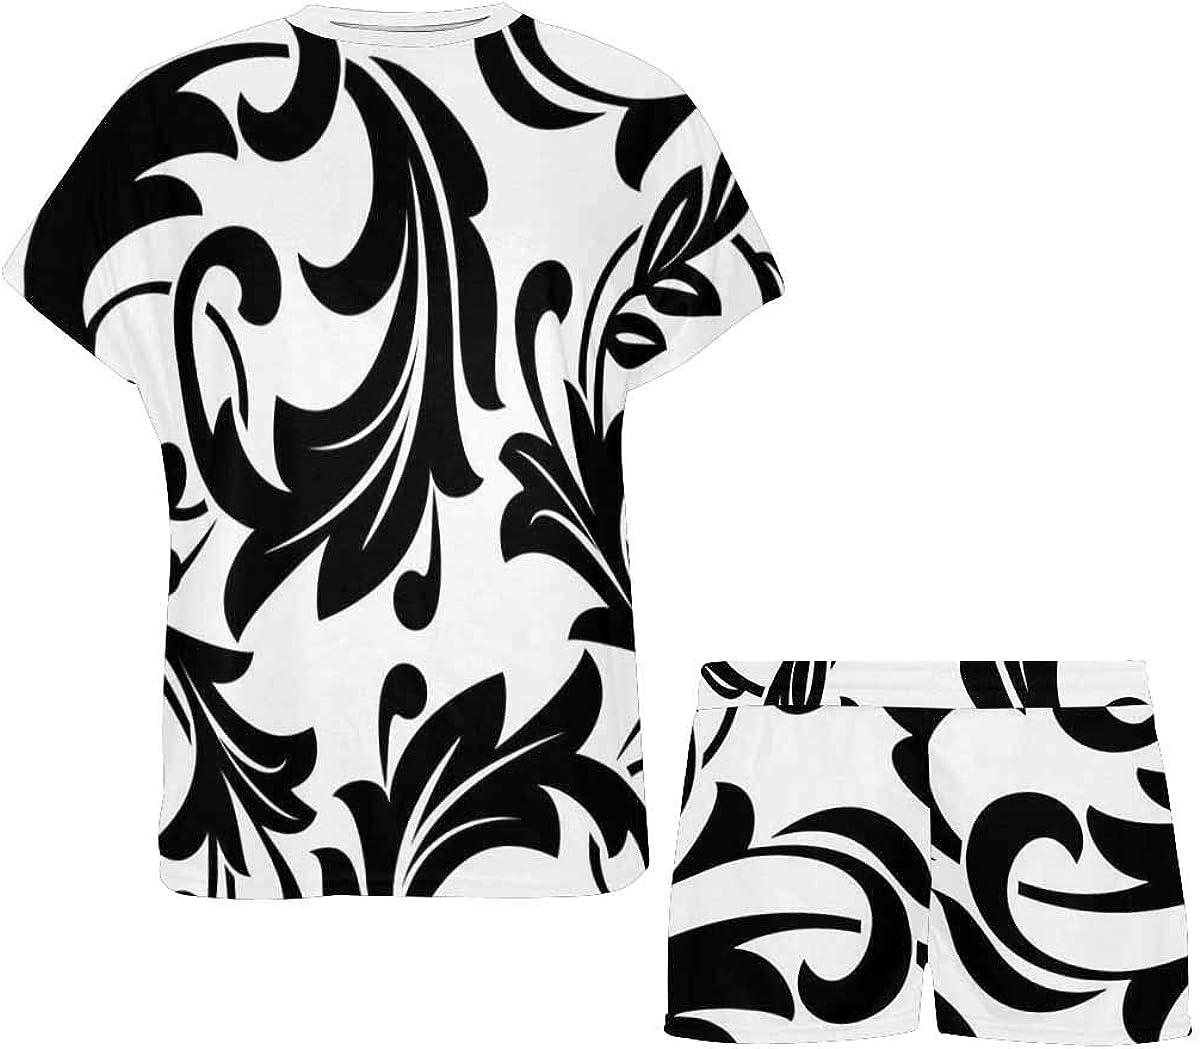 INTERESTPRINT Black Flowers on a Transparent Background Women's Lightweight Pajama Set, Short Summer Pjs